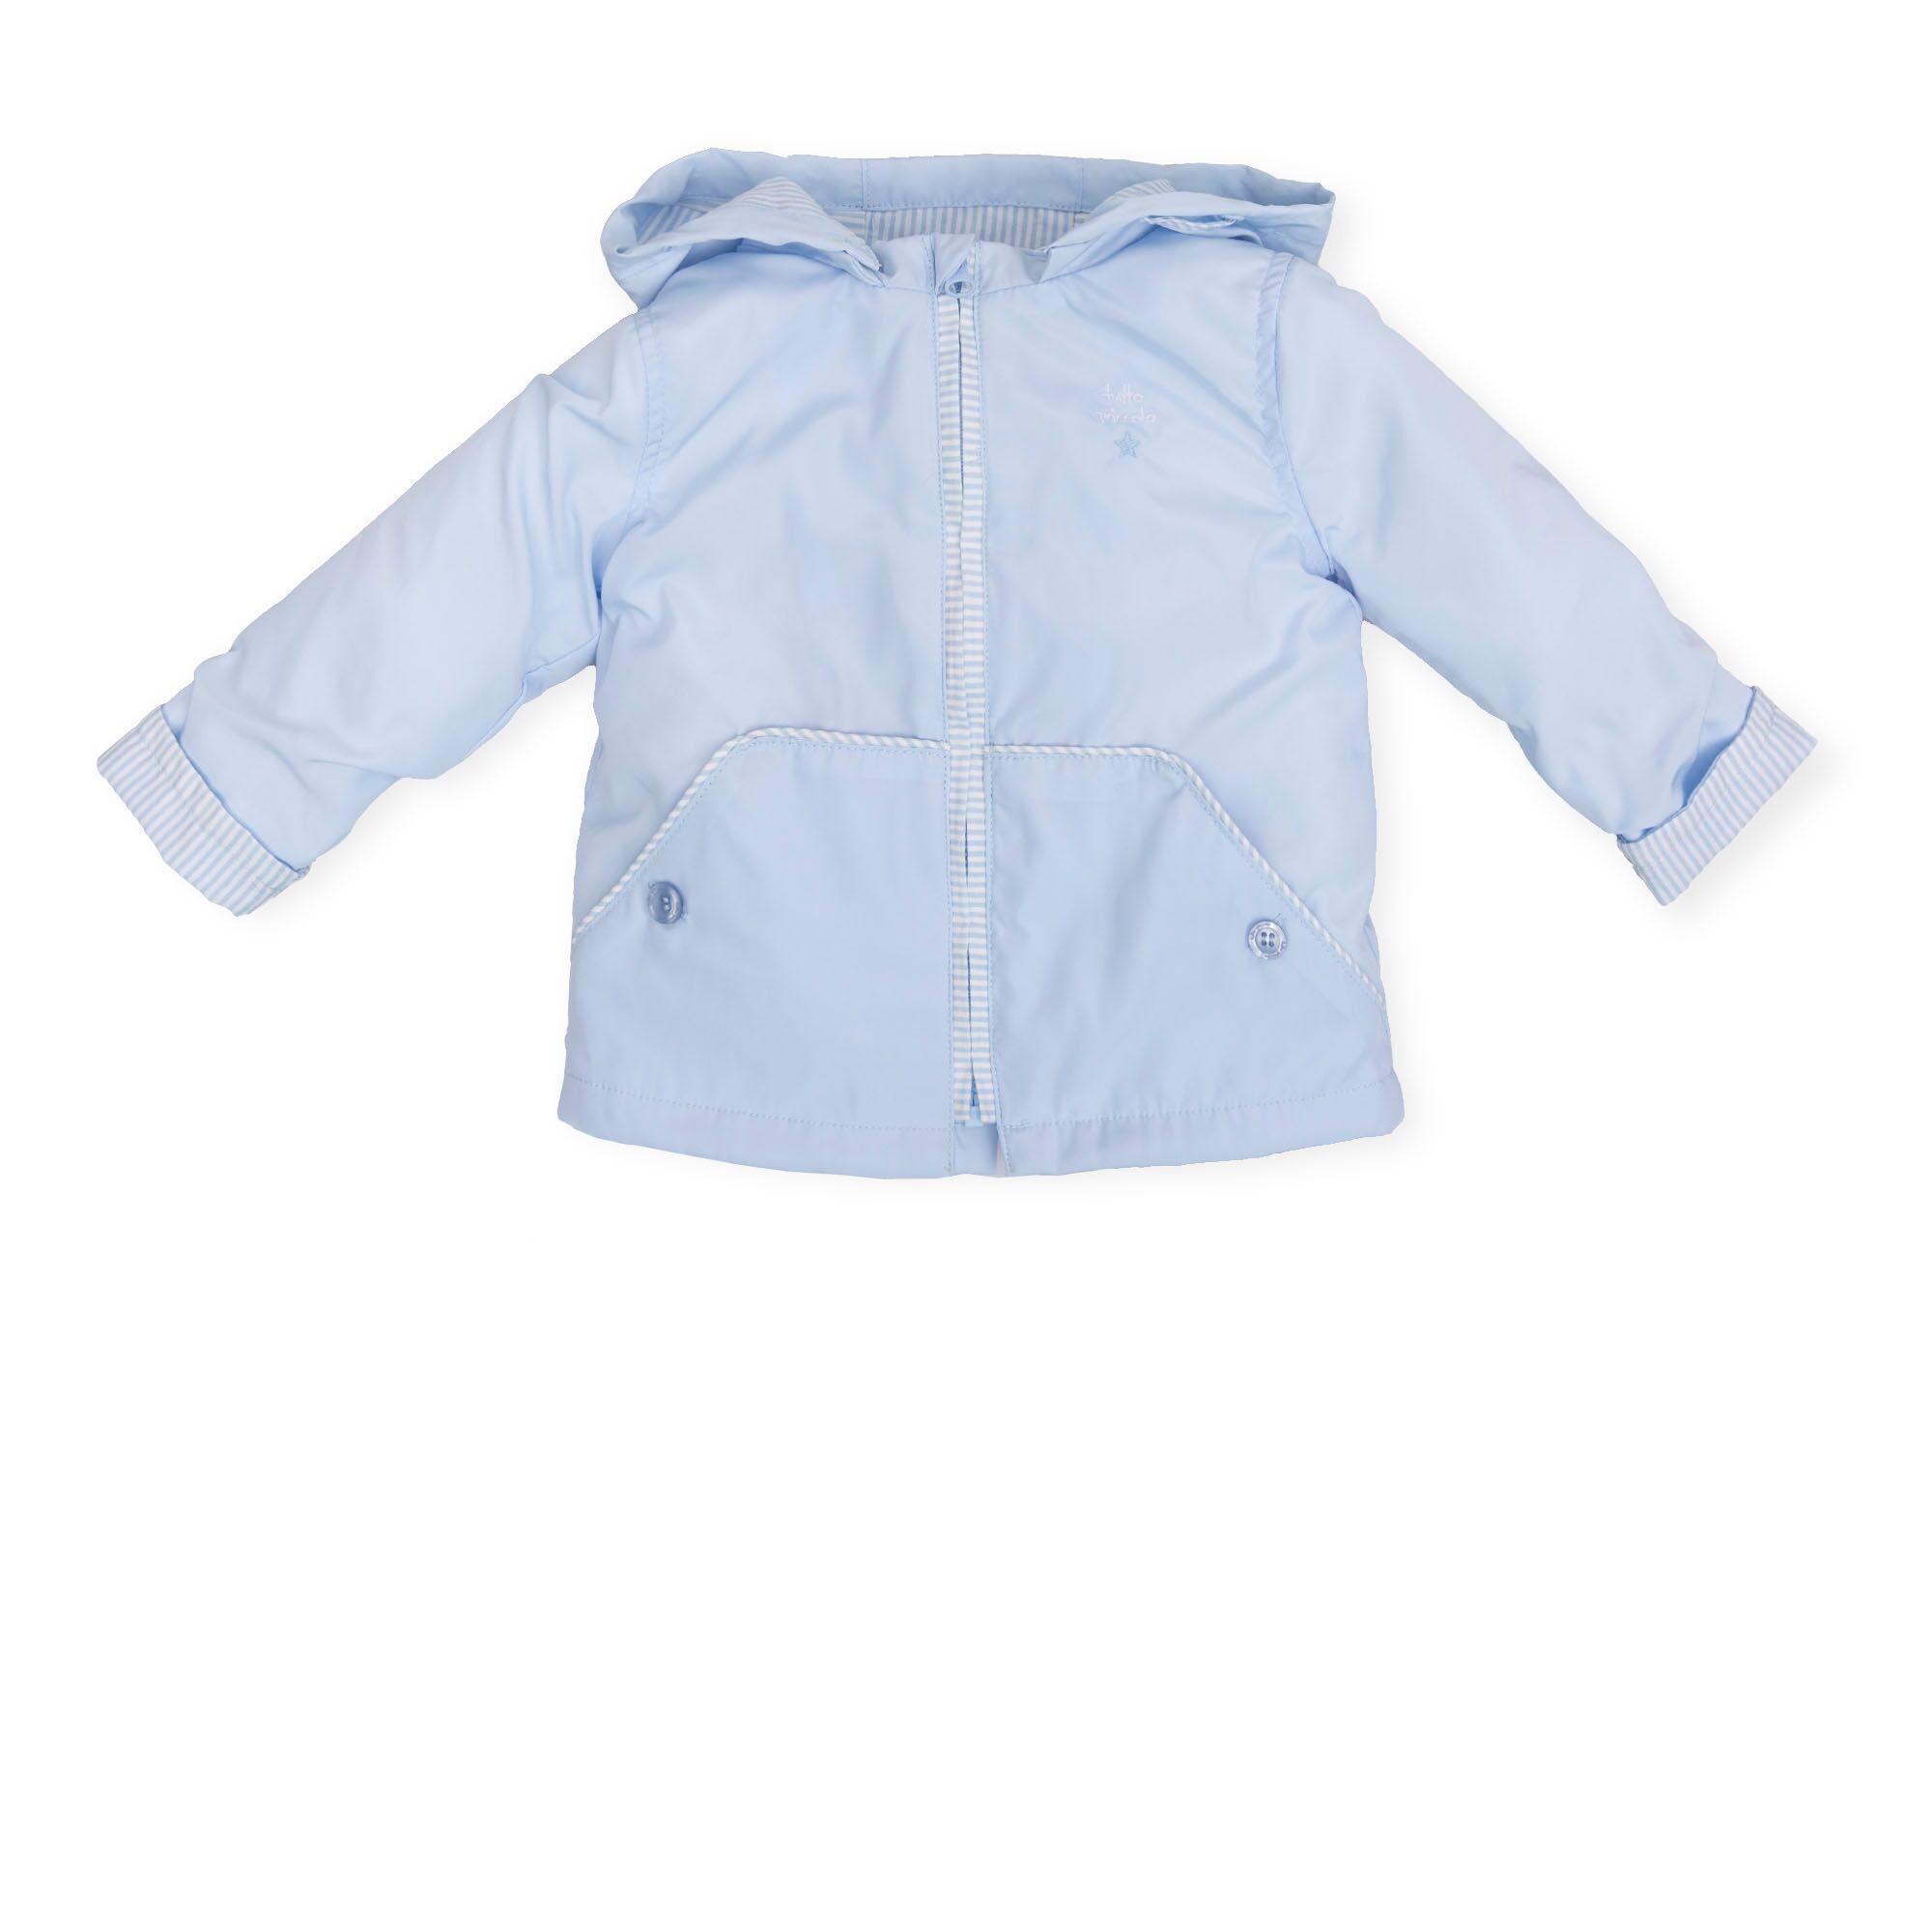 869cad3b3f0b Tutto Piccolo Raincoat - Childrens Clothes Shop Glasgow